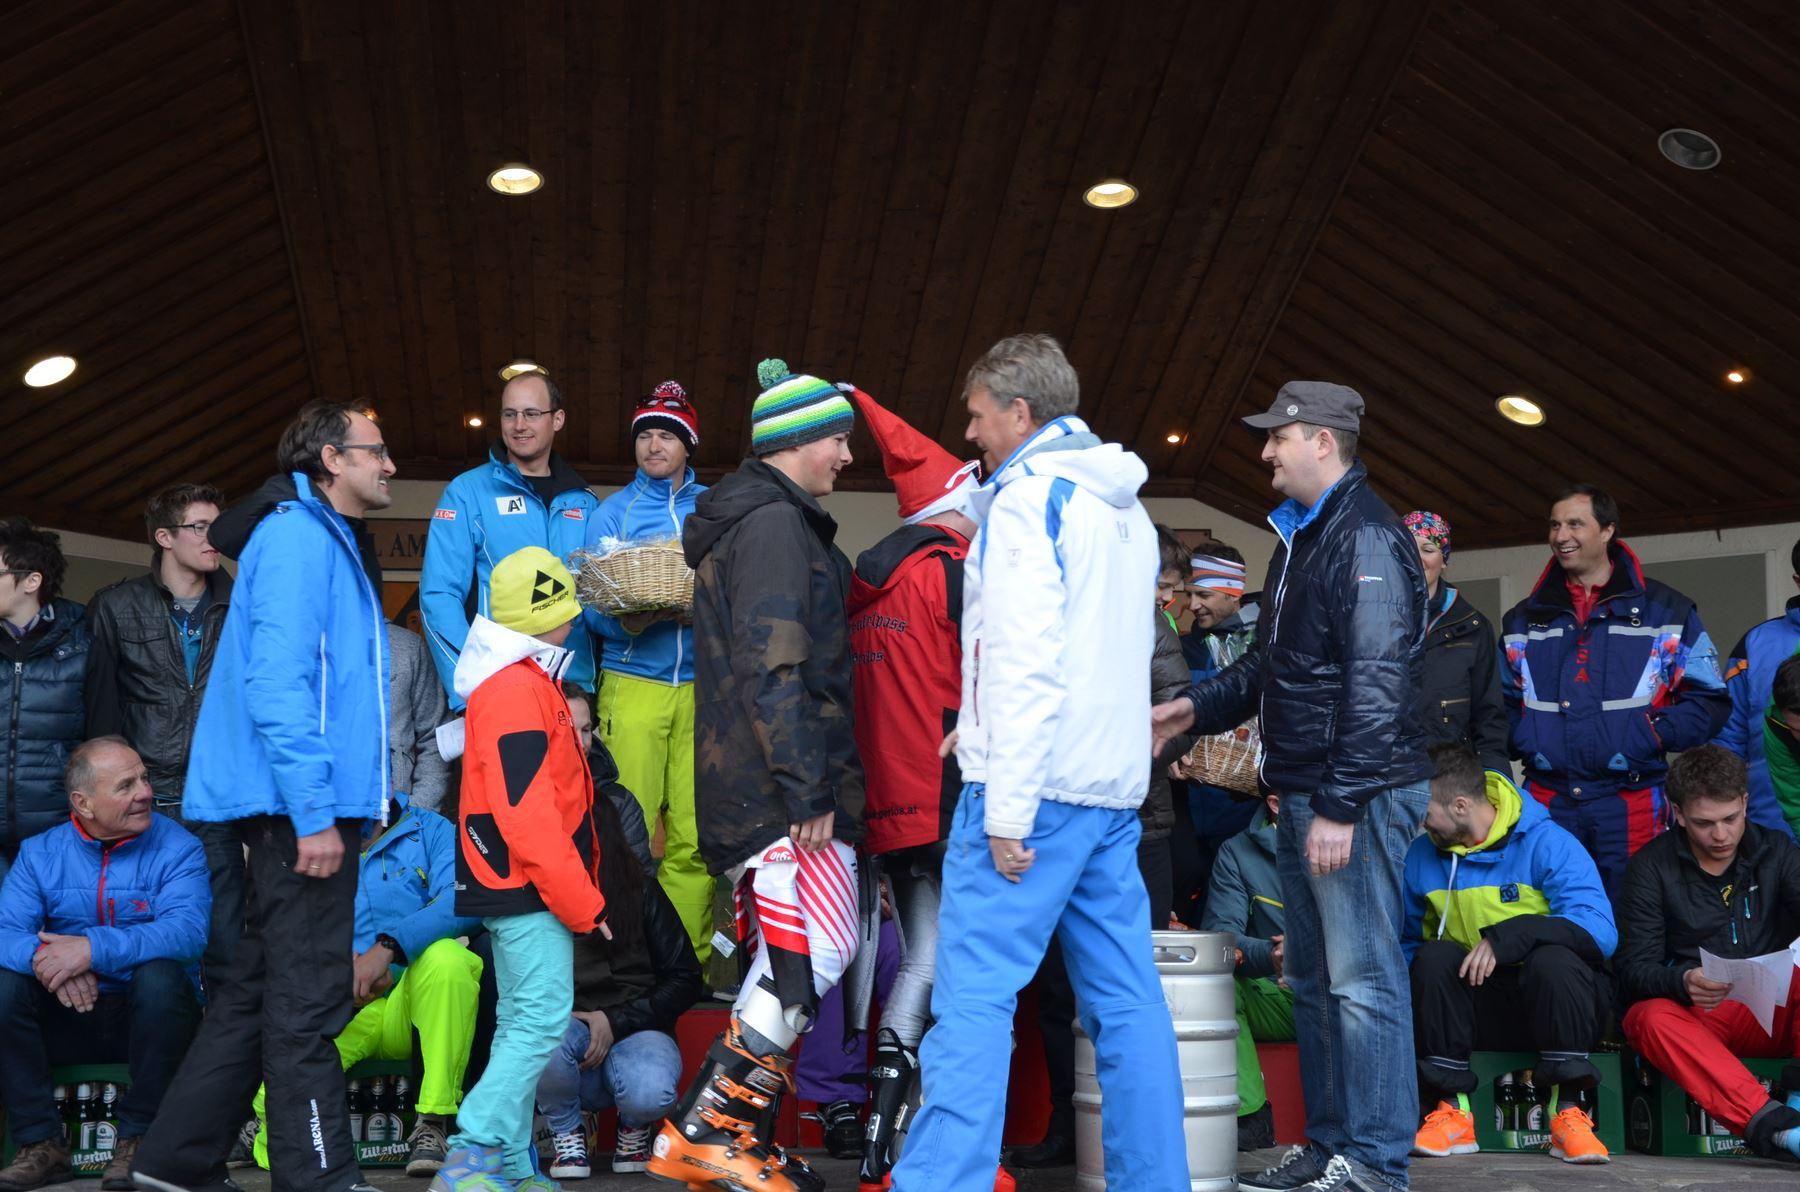 2015-03-22 BV Zillertal Skirennen 567.JPG